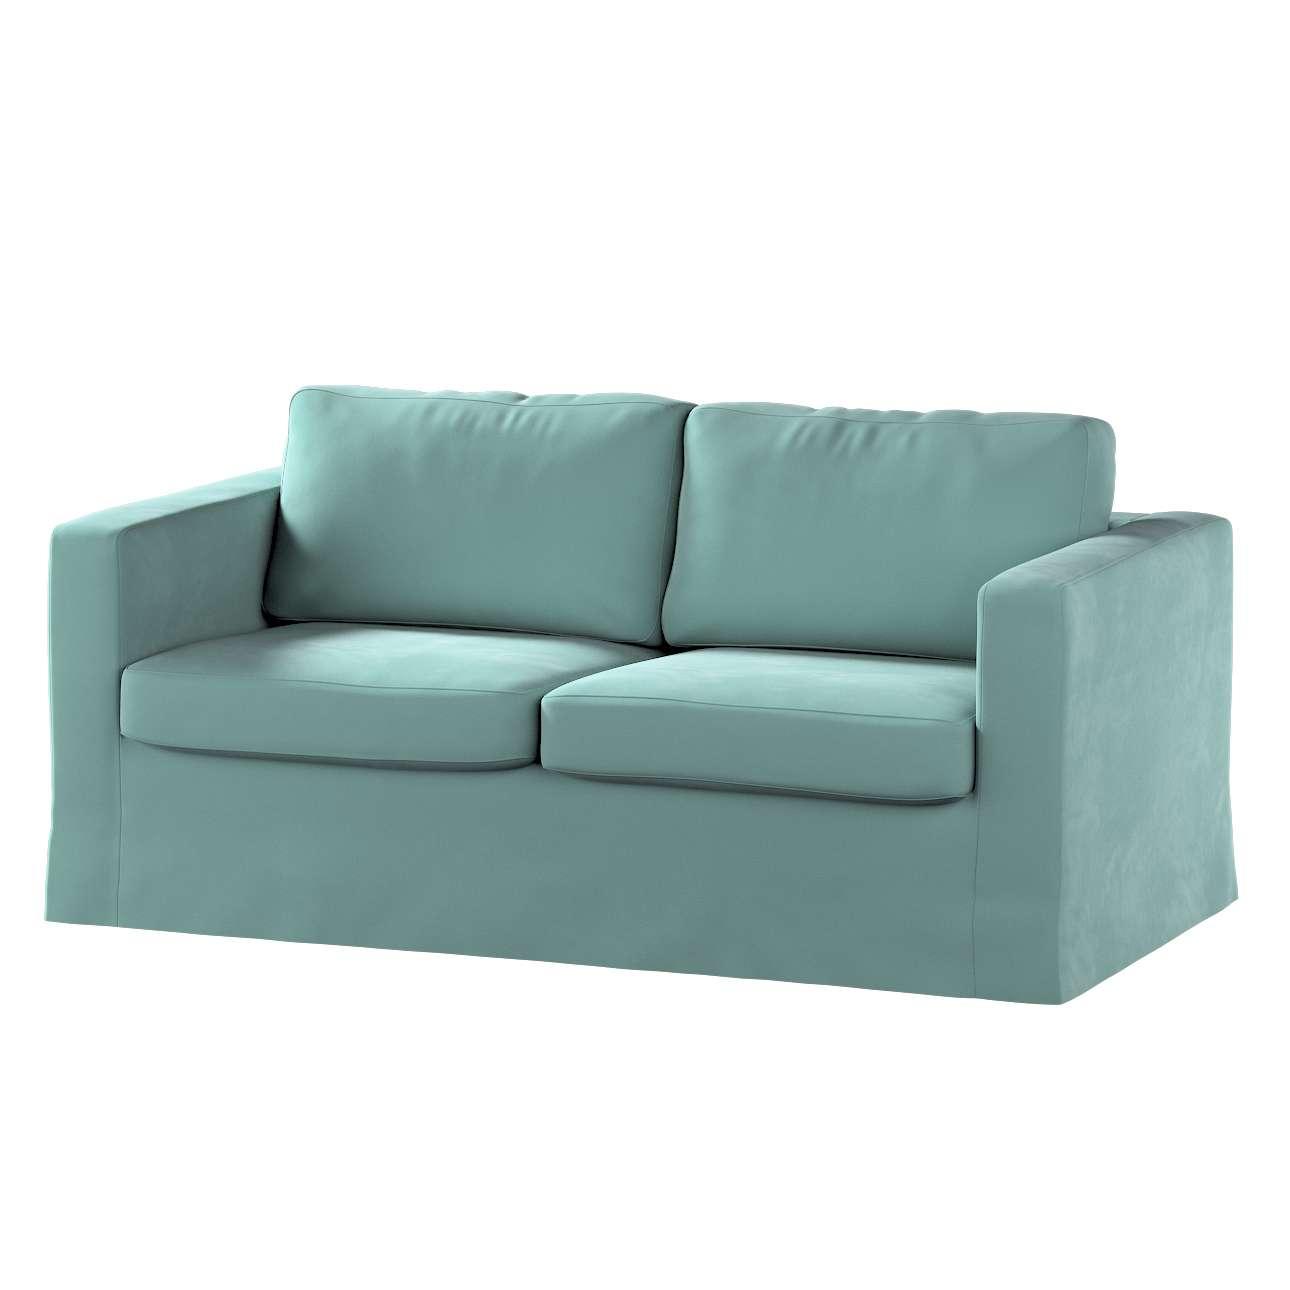 Floor length Karlstad 2-seater sofa cover in collection Velvet, fabric: 704-18